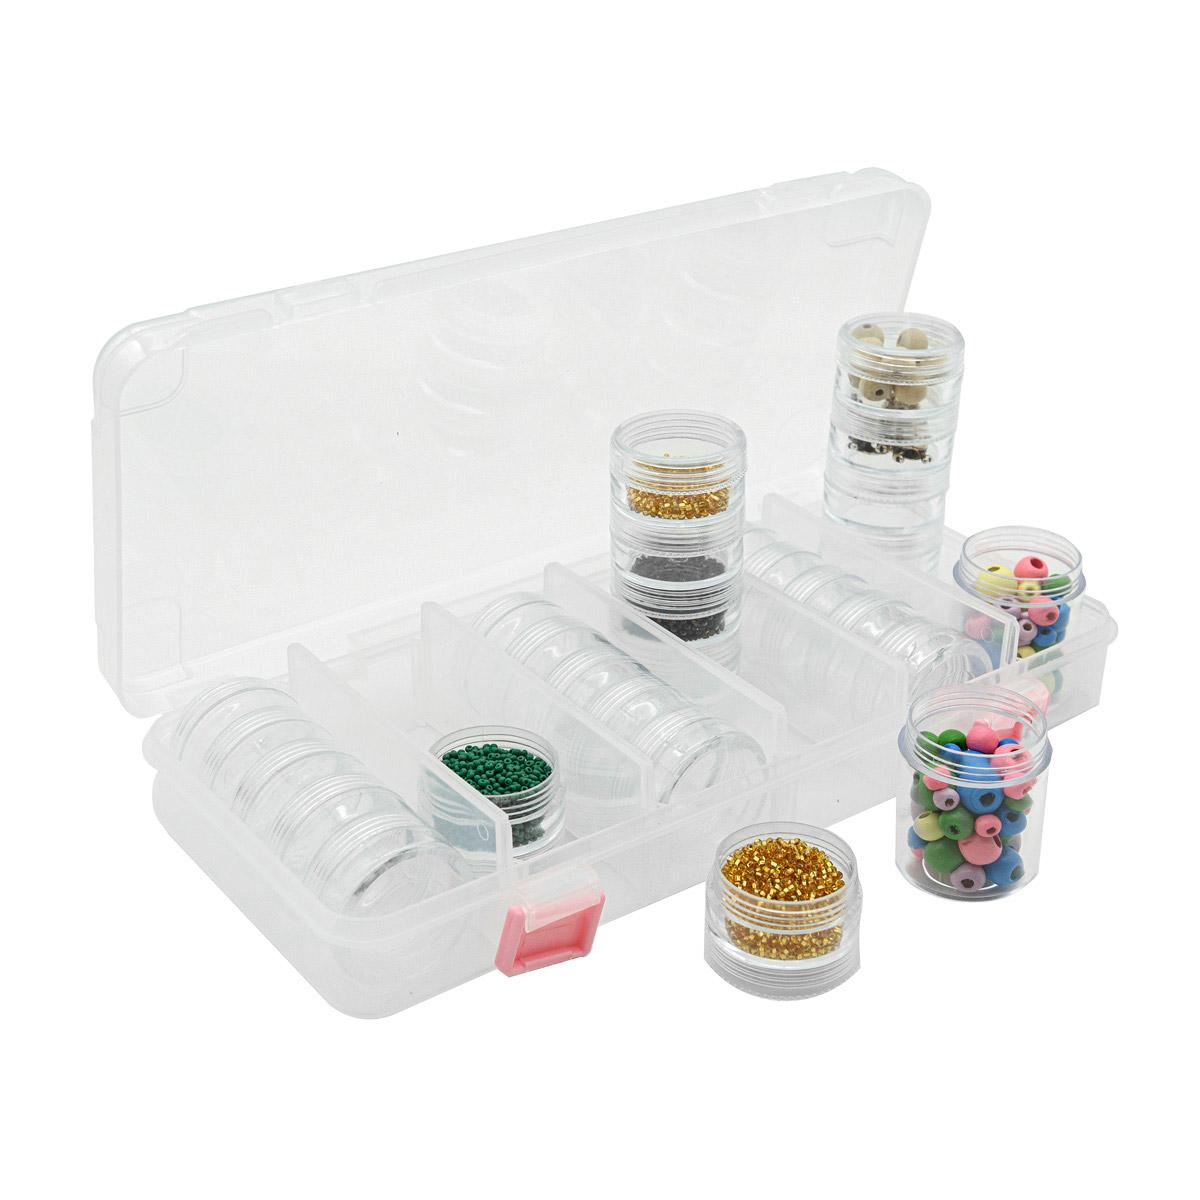 Контейнер для мелочей 930502, 6 секций, 27,9х13,1х4,5 см, Hobby&Pro